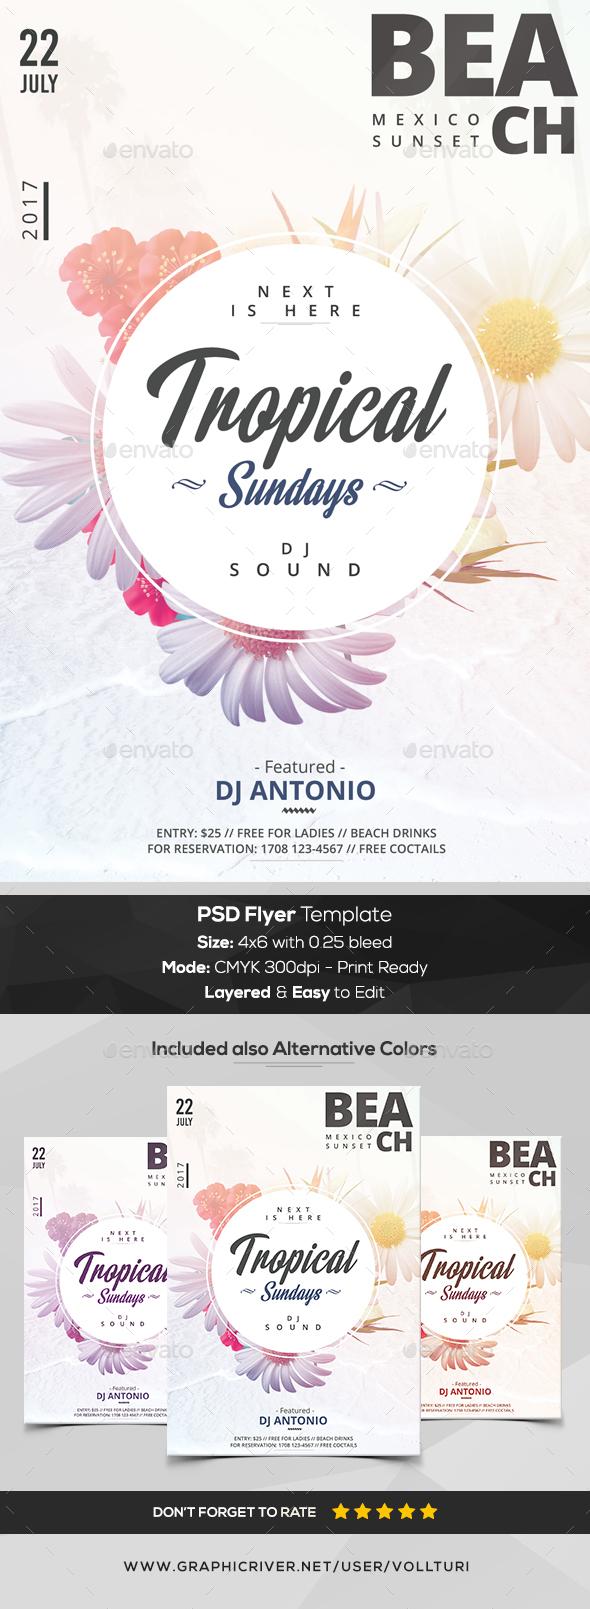 Tropical Sundays - PSD Flyer Template - Flyers Print Templates